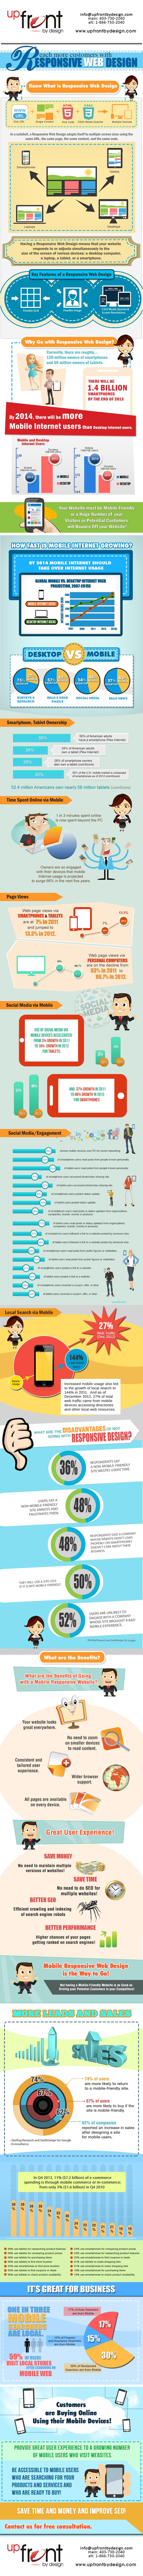 UpFrontByDesign.com-Responsive-Web-Design-Infographic